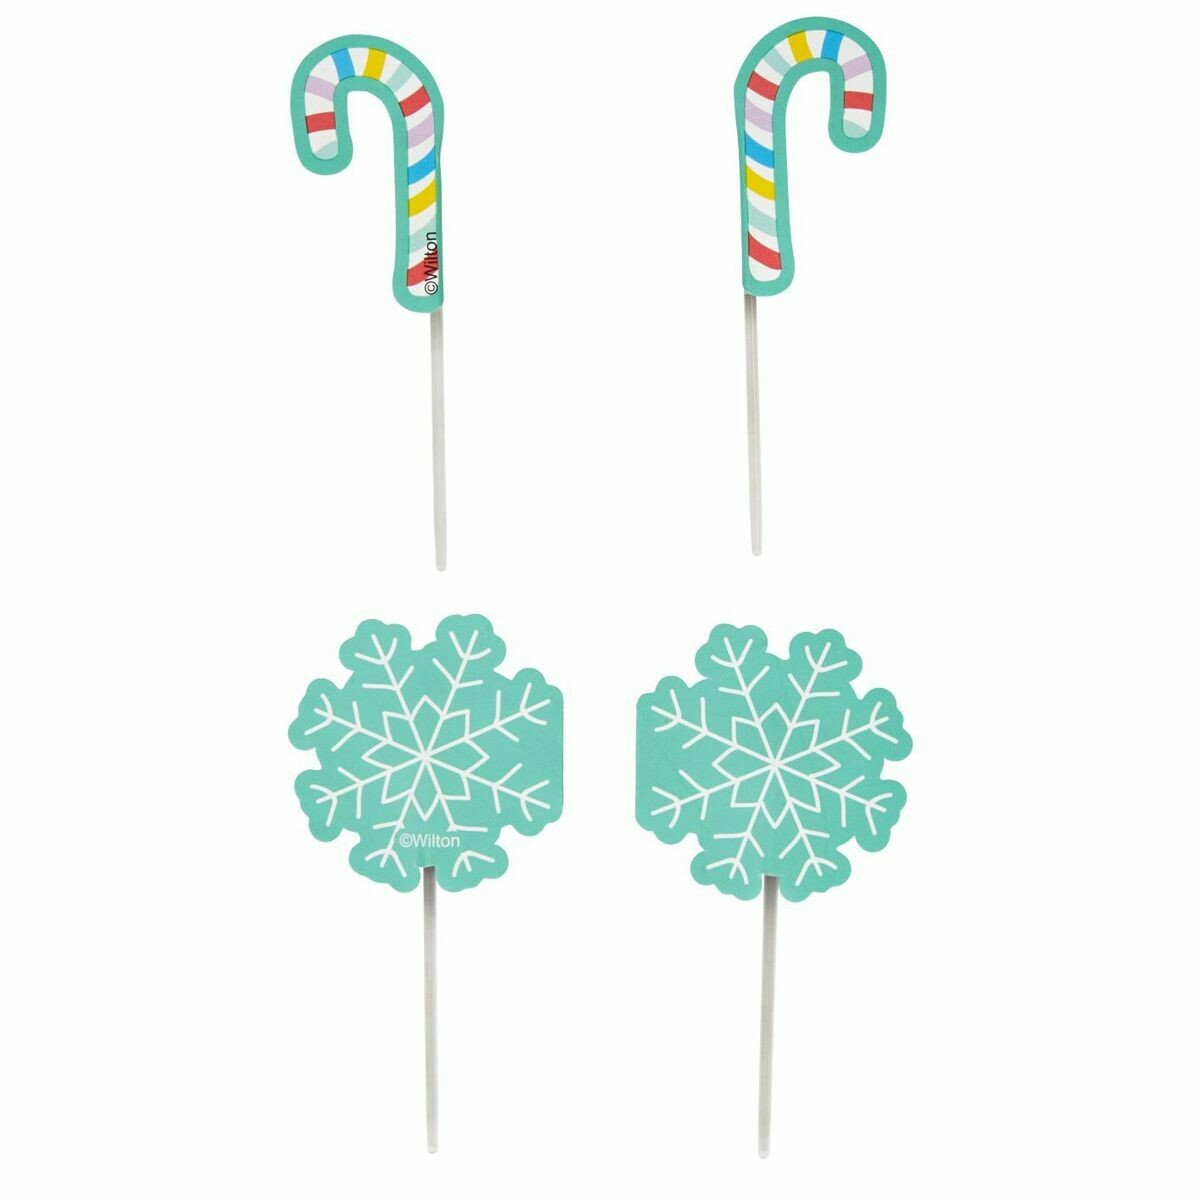 SALE!!! Wilton Treat Picks SNOWFLAKES & CANDY CANES -12τεμ - Σετ 12τεμ Χριστουγεννιάτικα Τόπερ Χιονονιφάδες και Γλειφιτζούρια